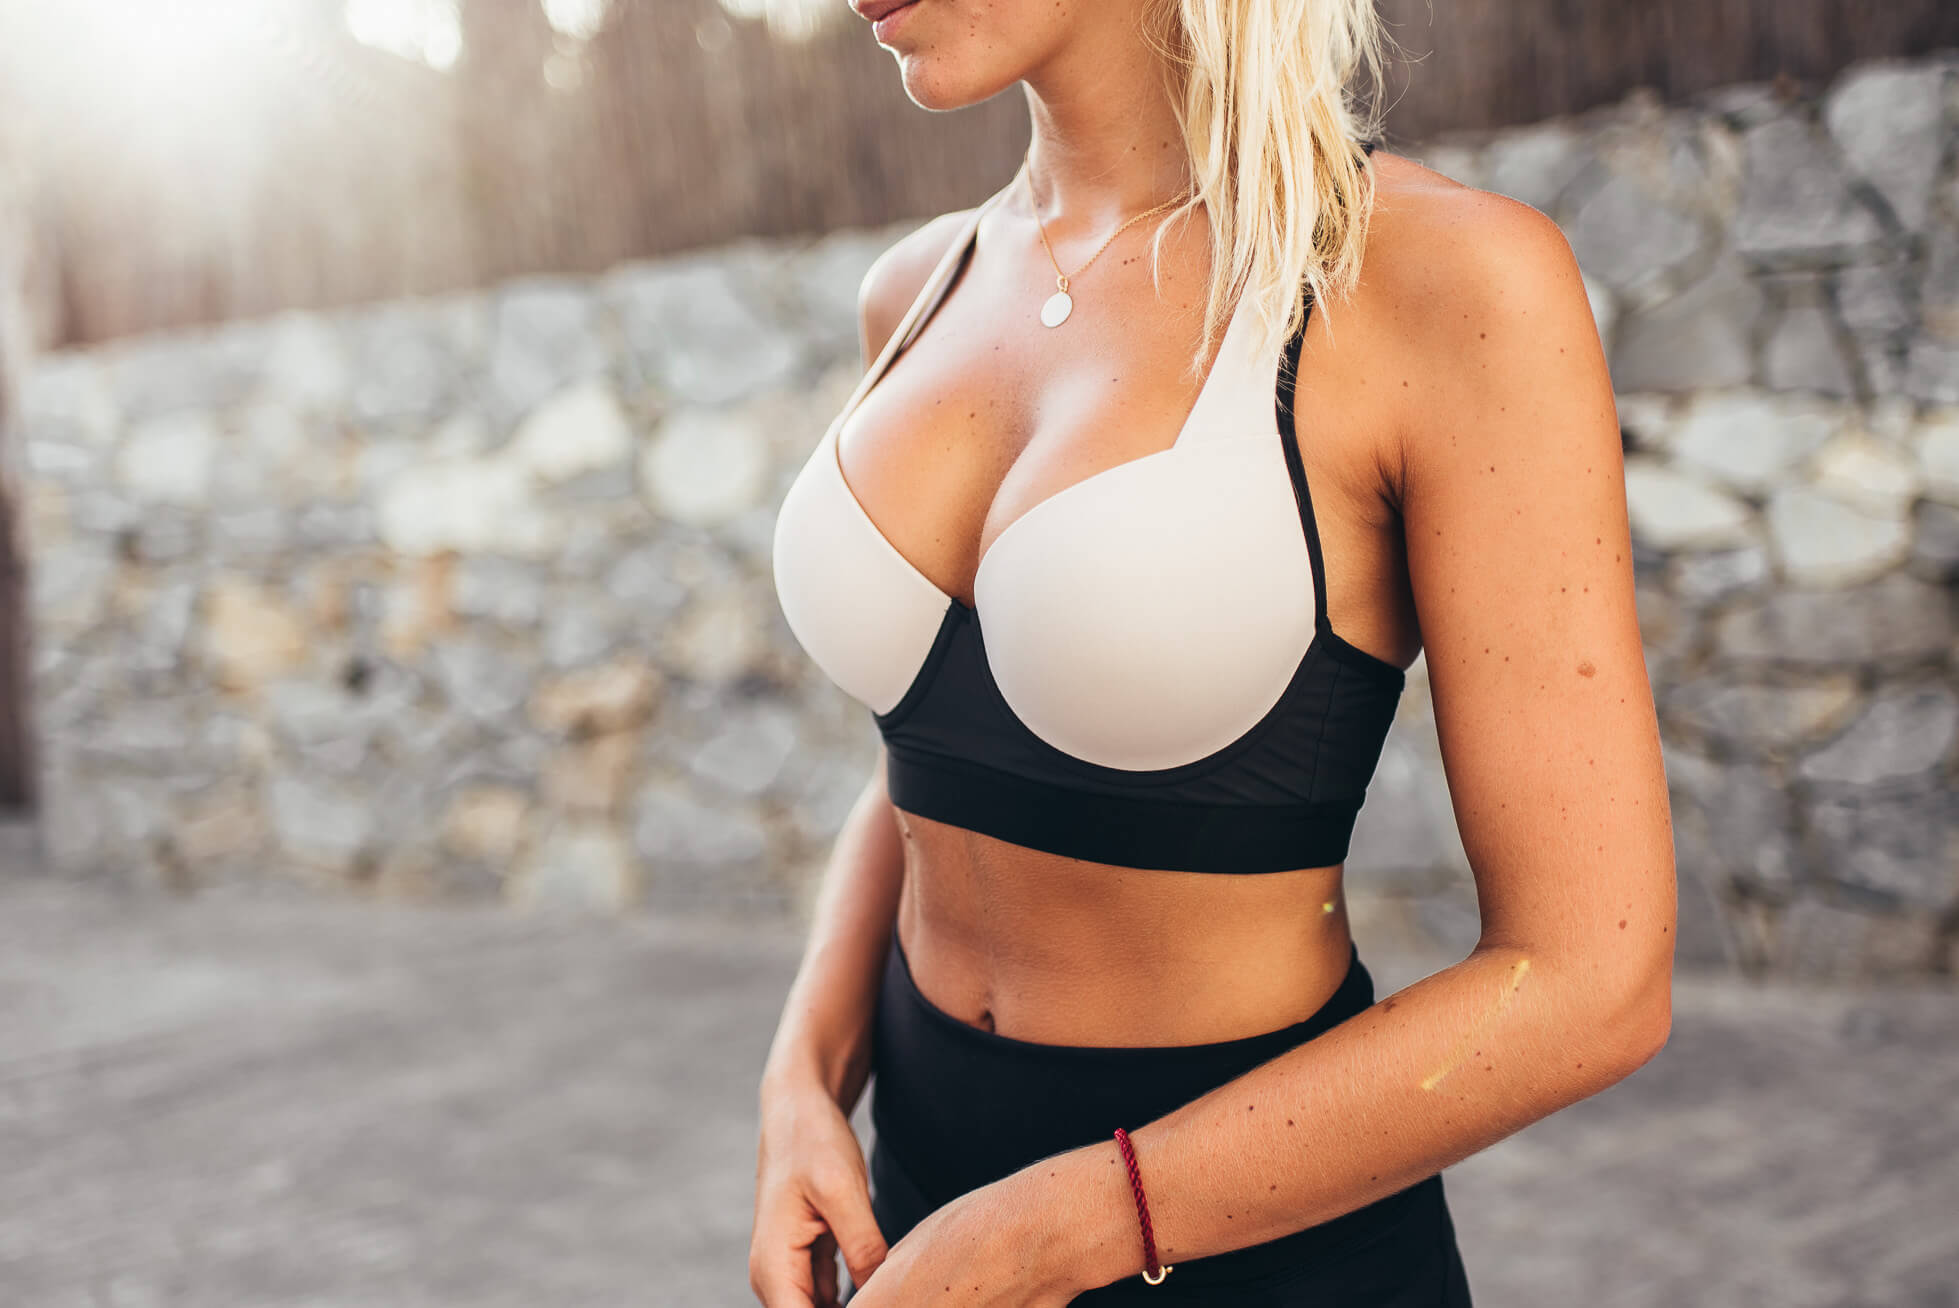 janni-deler-workout-lookDSC_9884